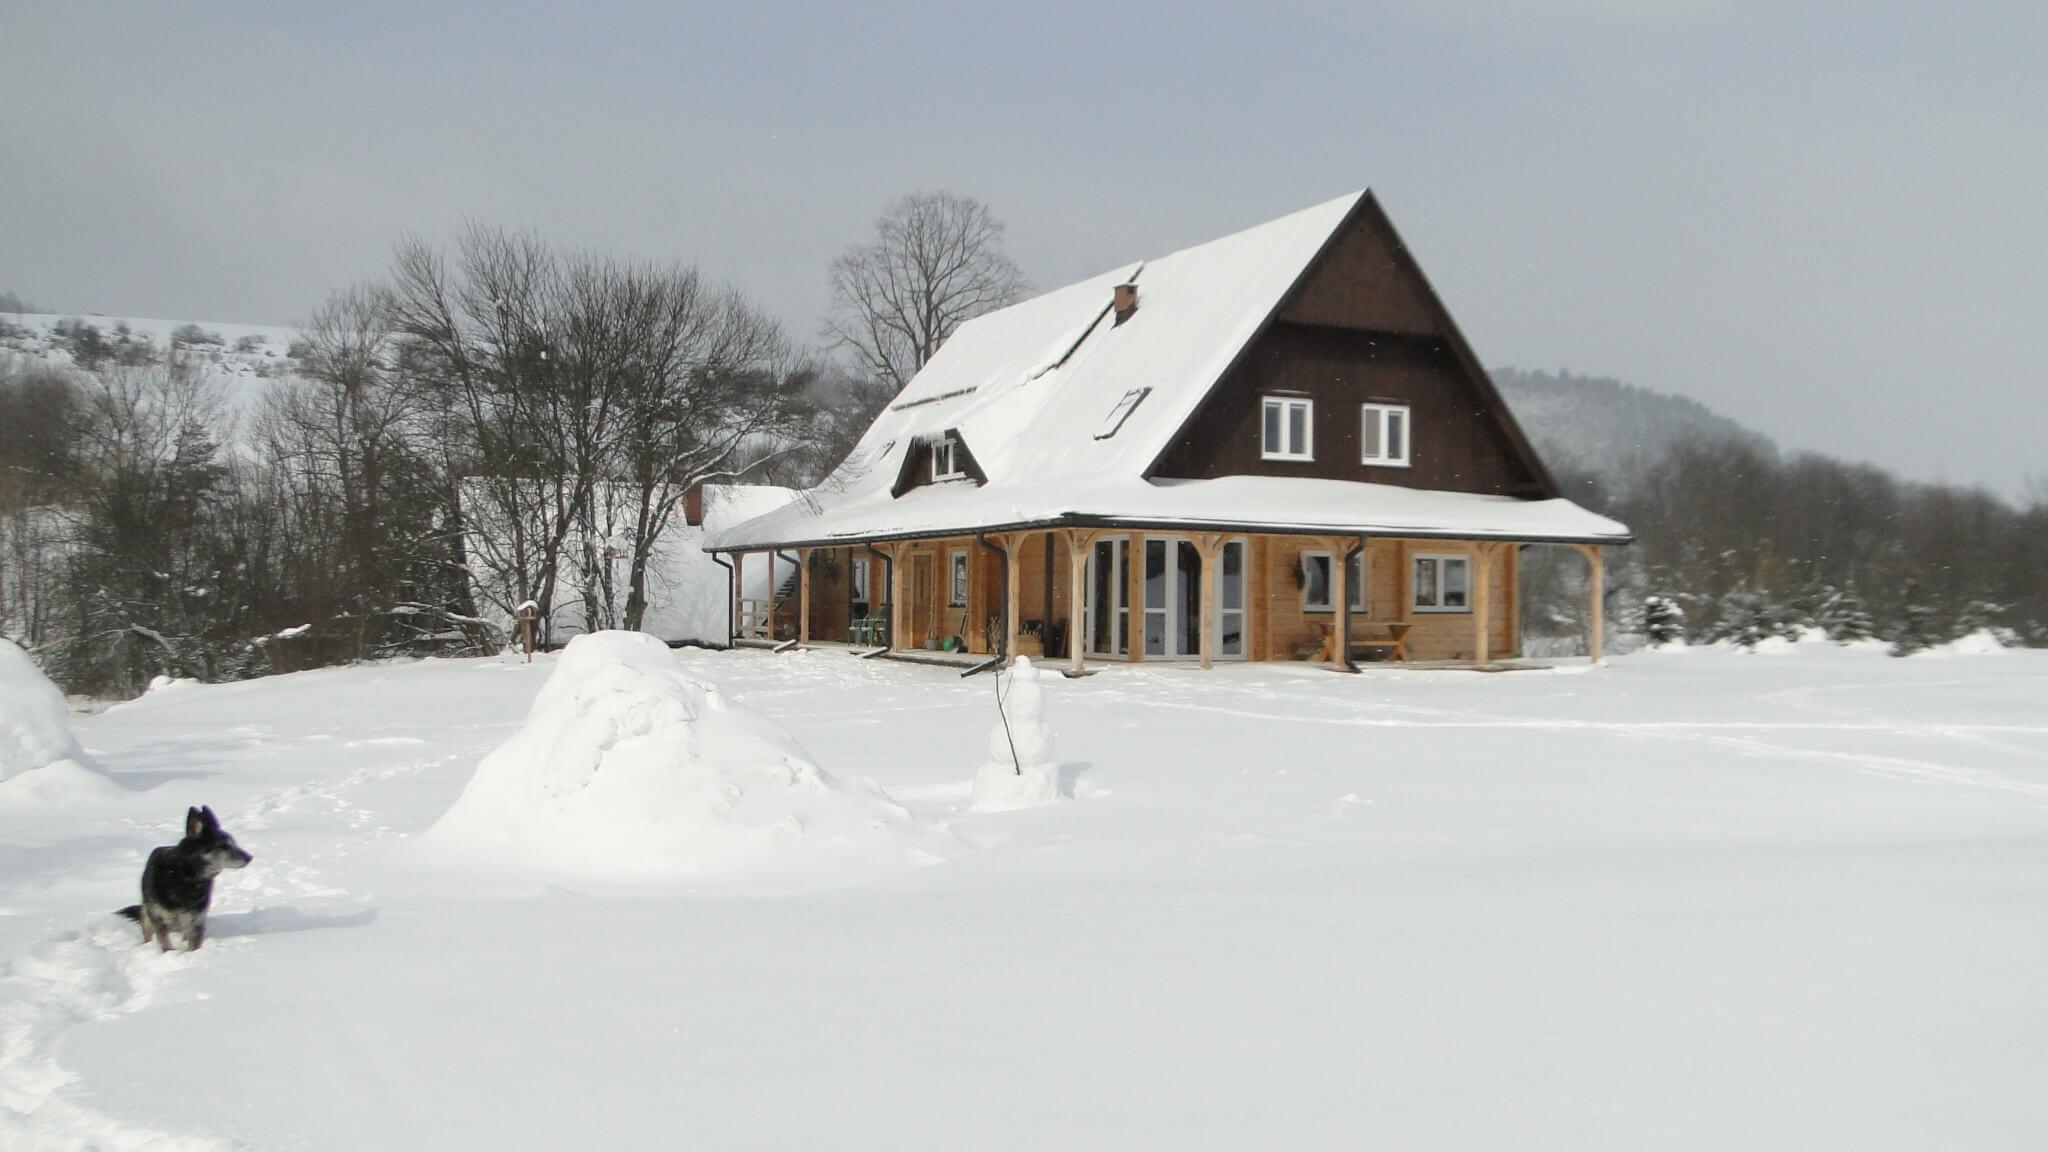 Lutowa zima - śnieżna i mroźna 25